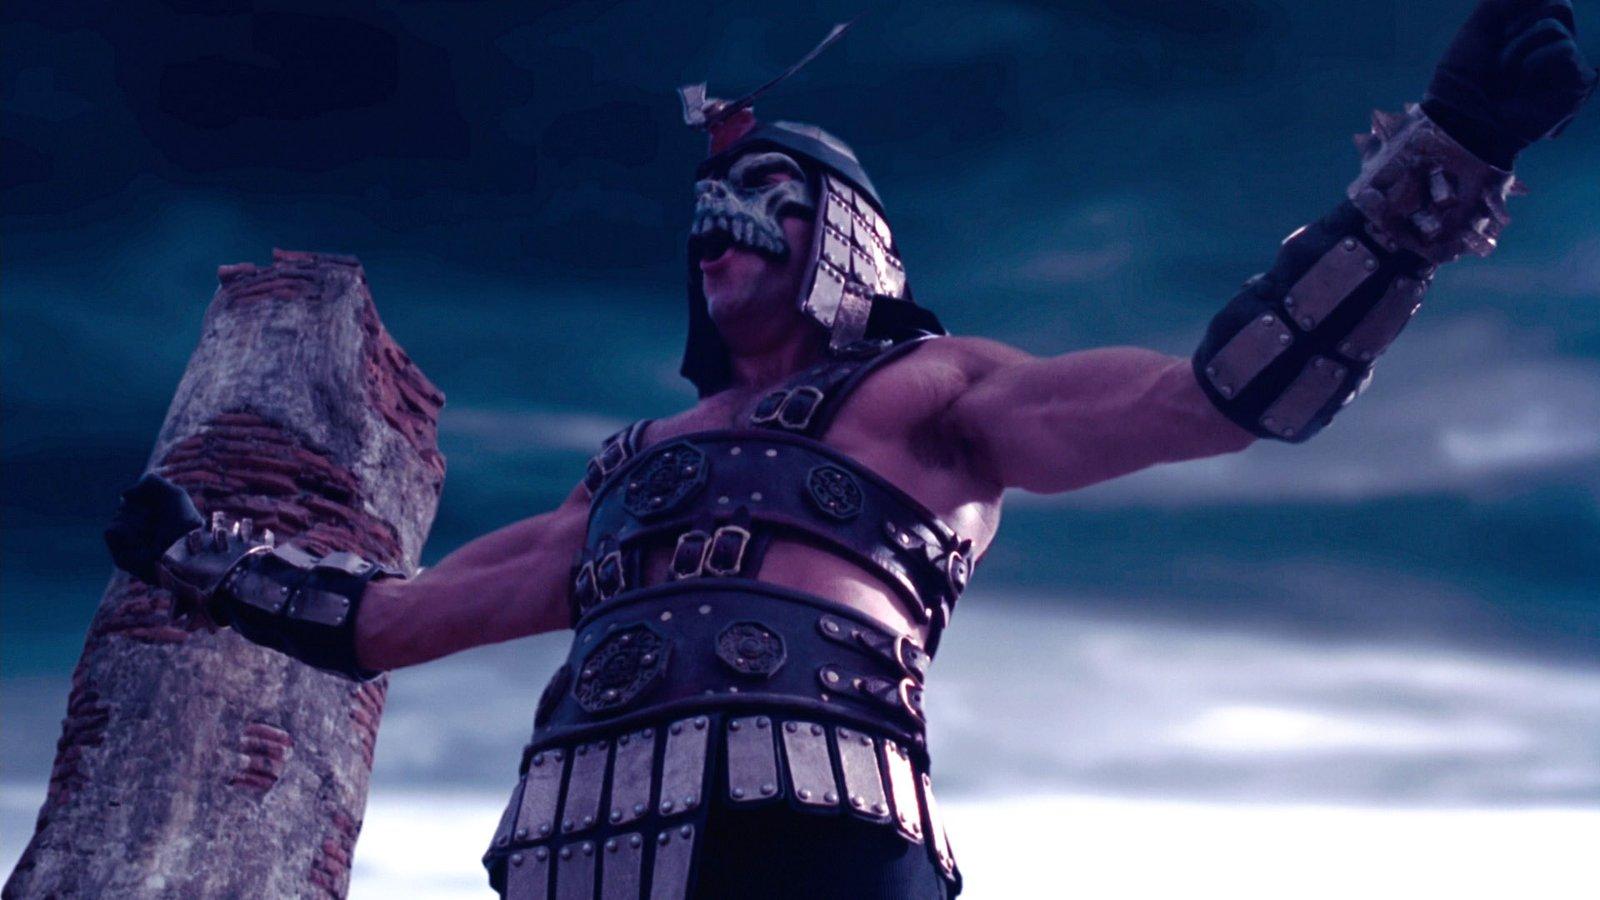 / Mortal Kombat: Annihilation